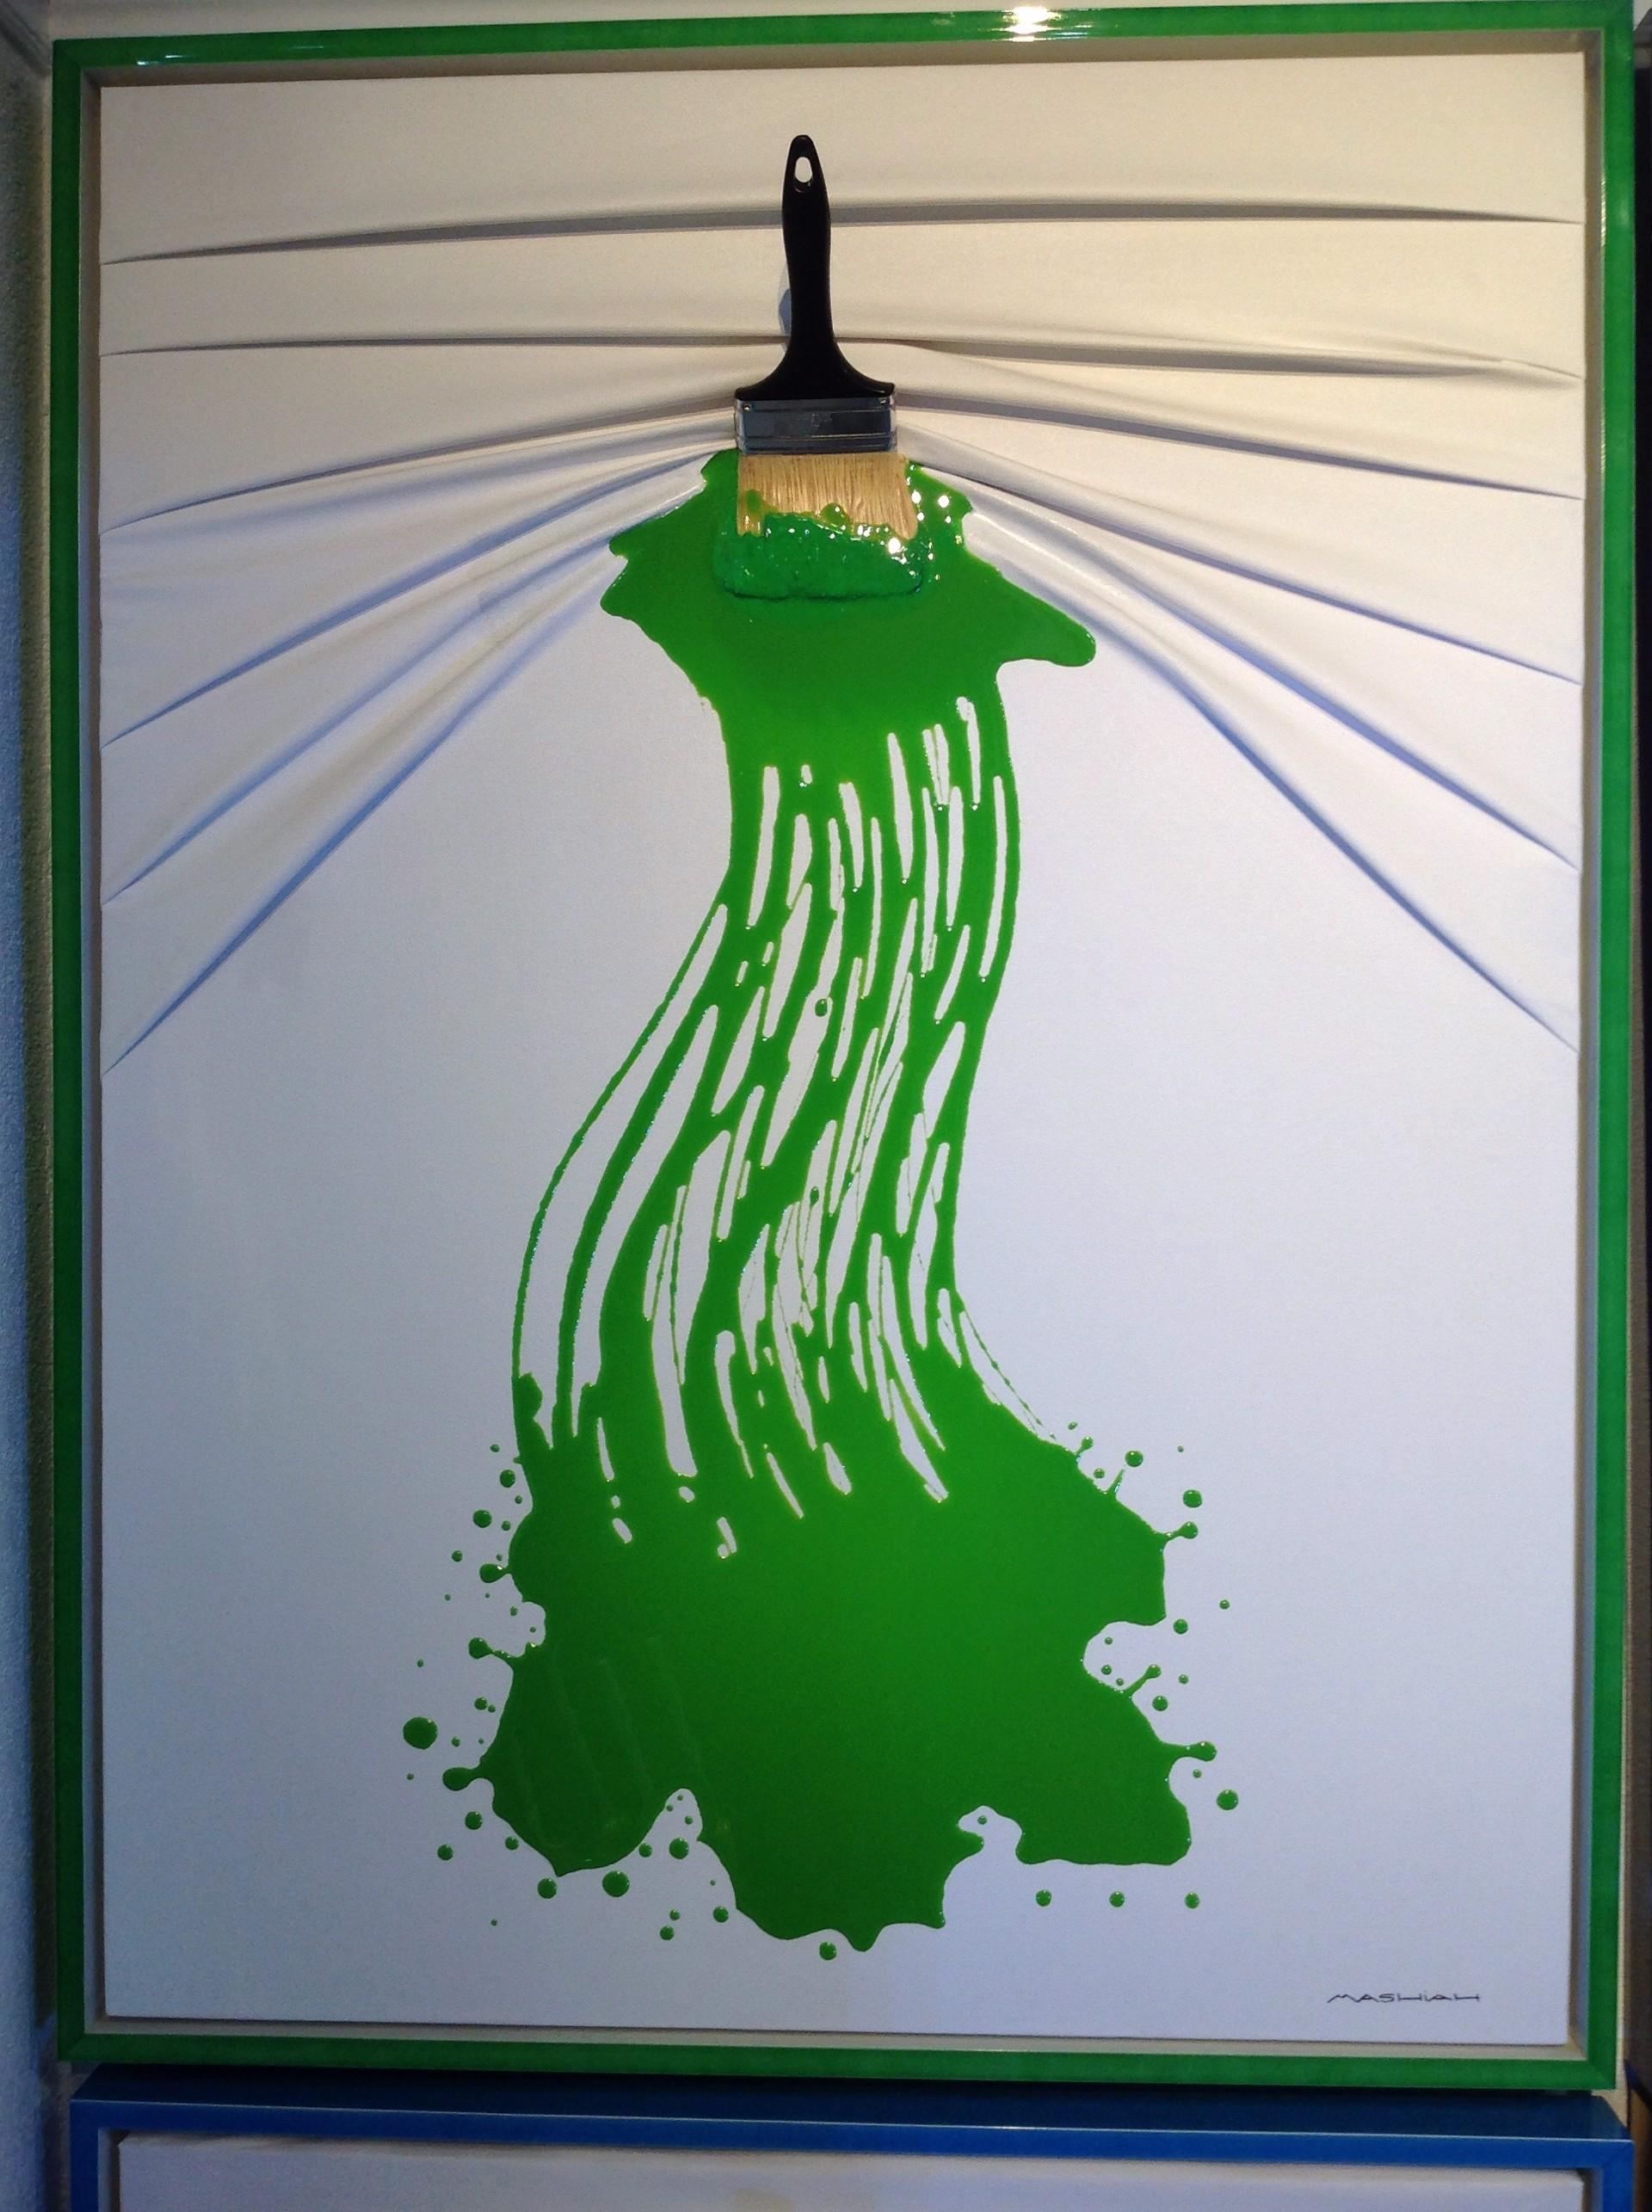 """Lets Paint"" Brush Green on White by Efi Mashiah"